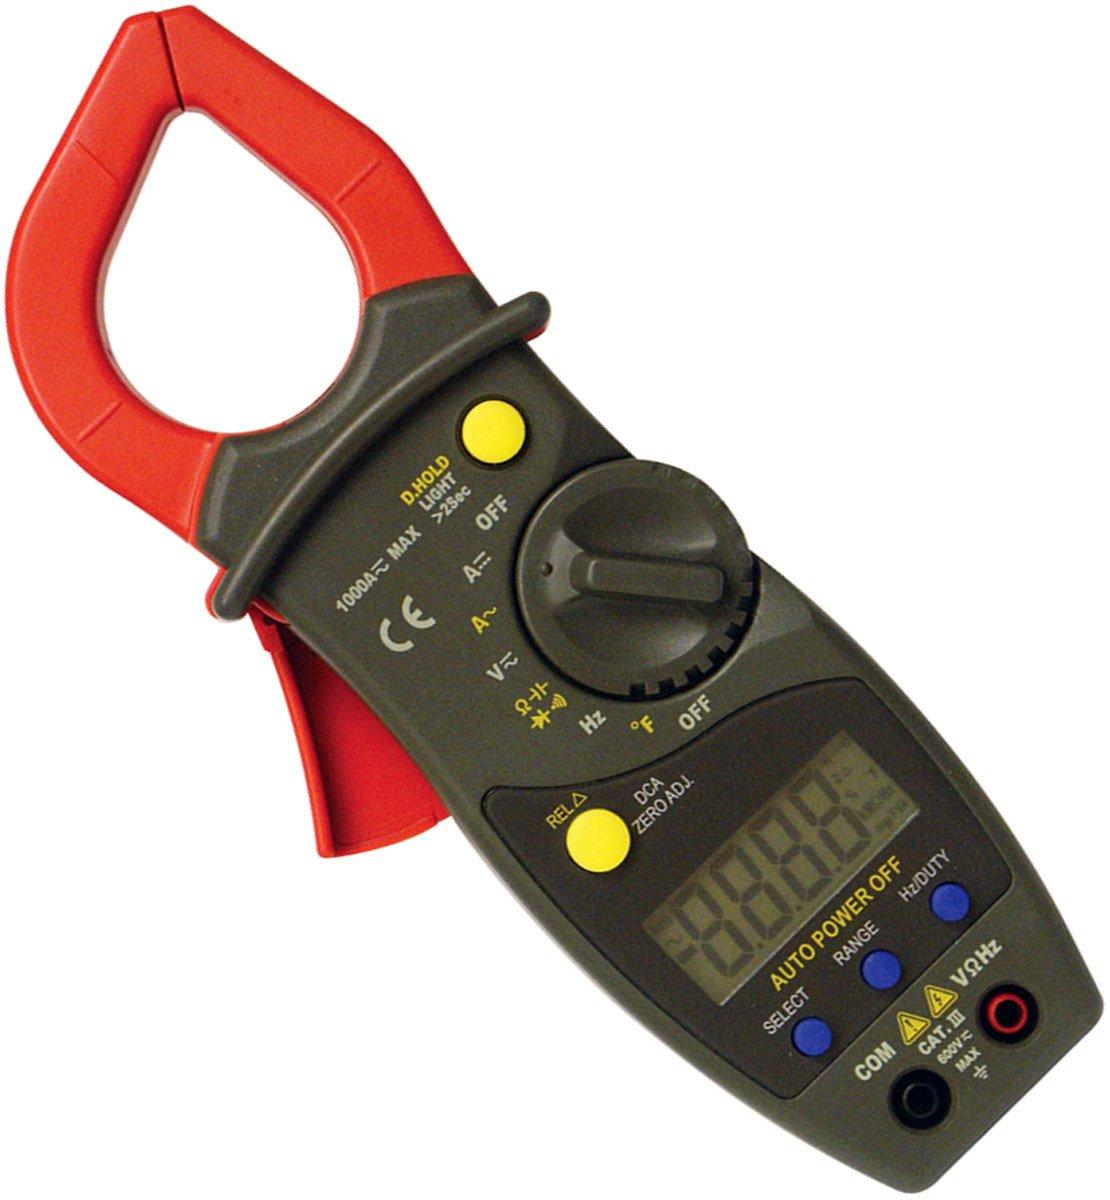 Auto ranging AC/DC Digital Clamp Meter